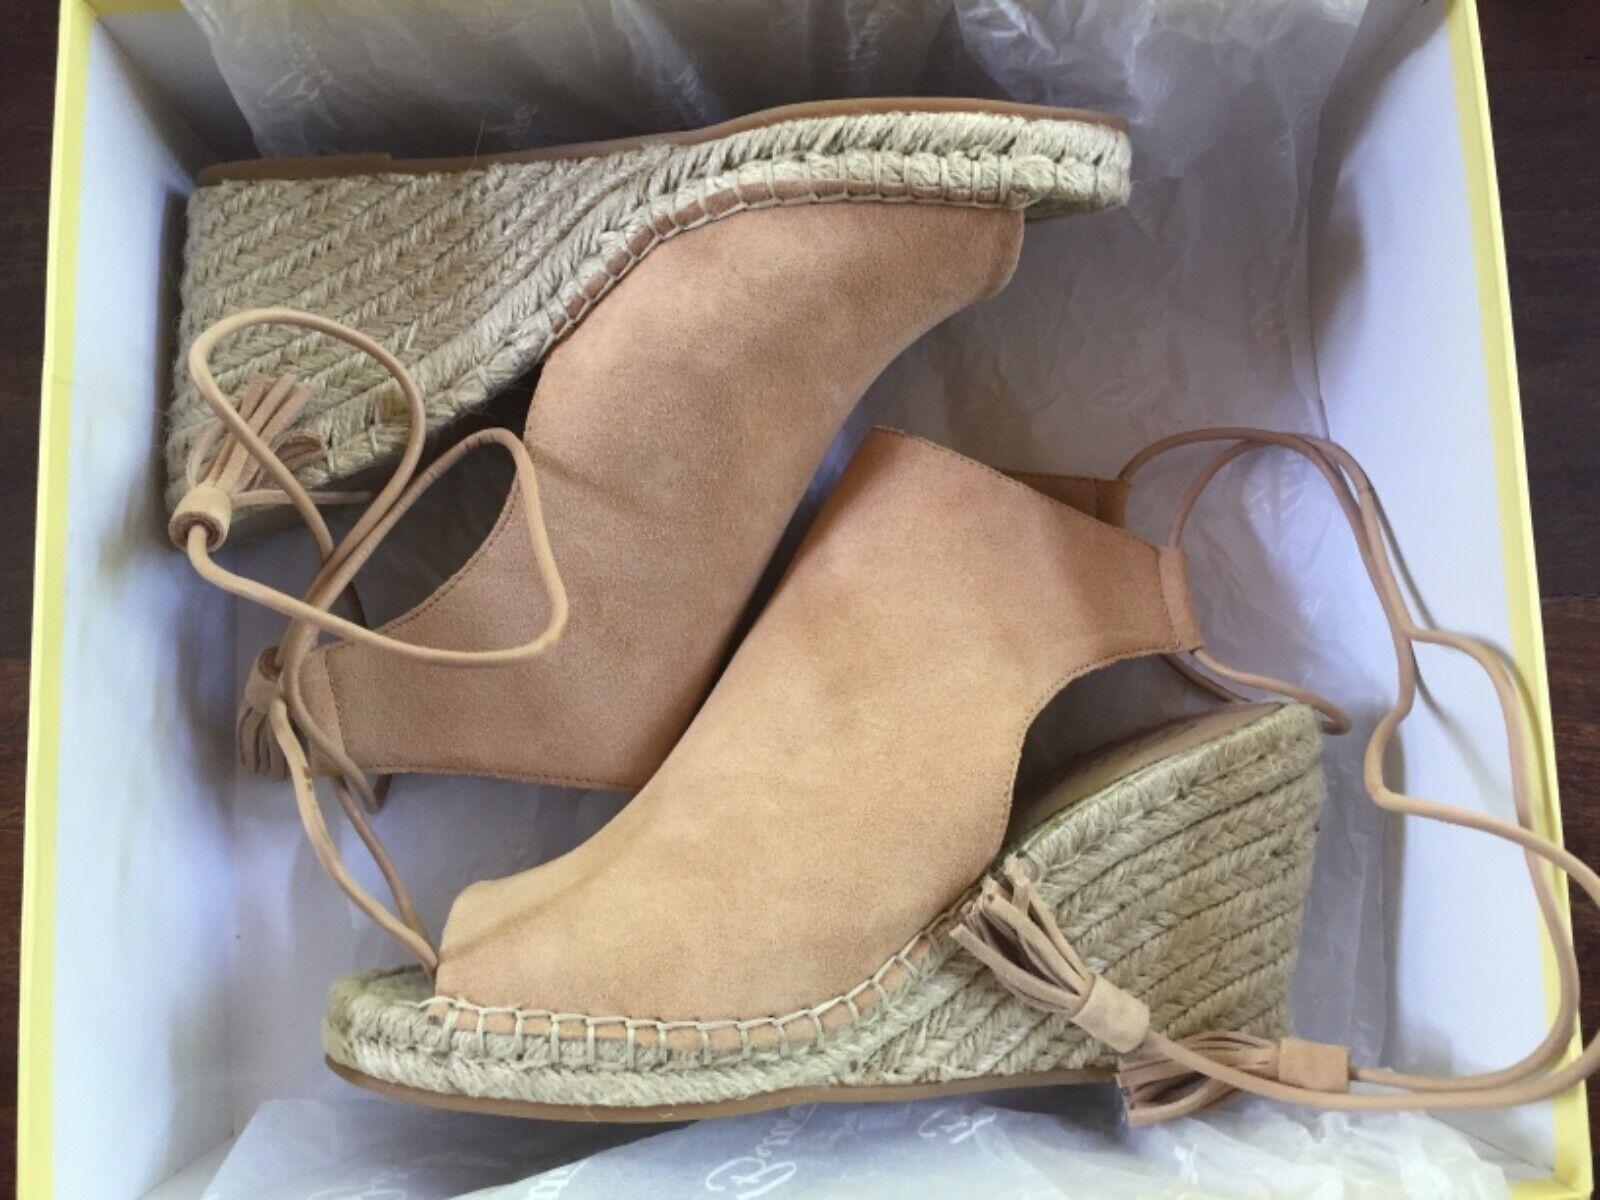 New 7.5 Bettye Women's Hailey suede wedge nude tan suede sandals natural bluesh